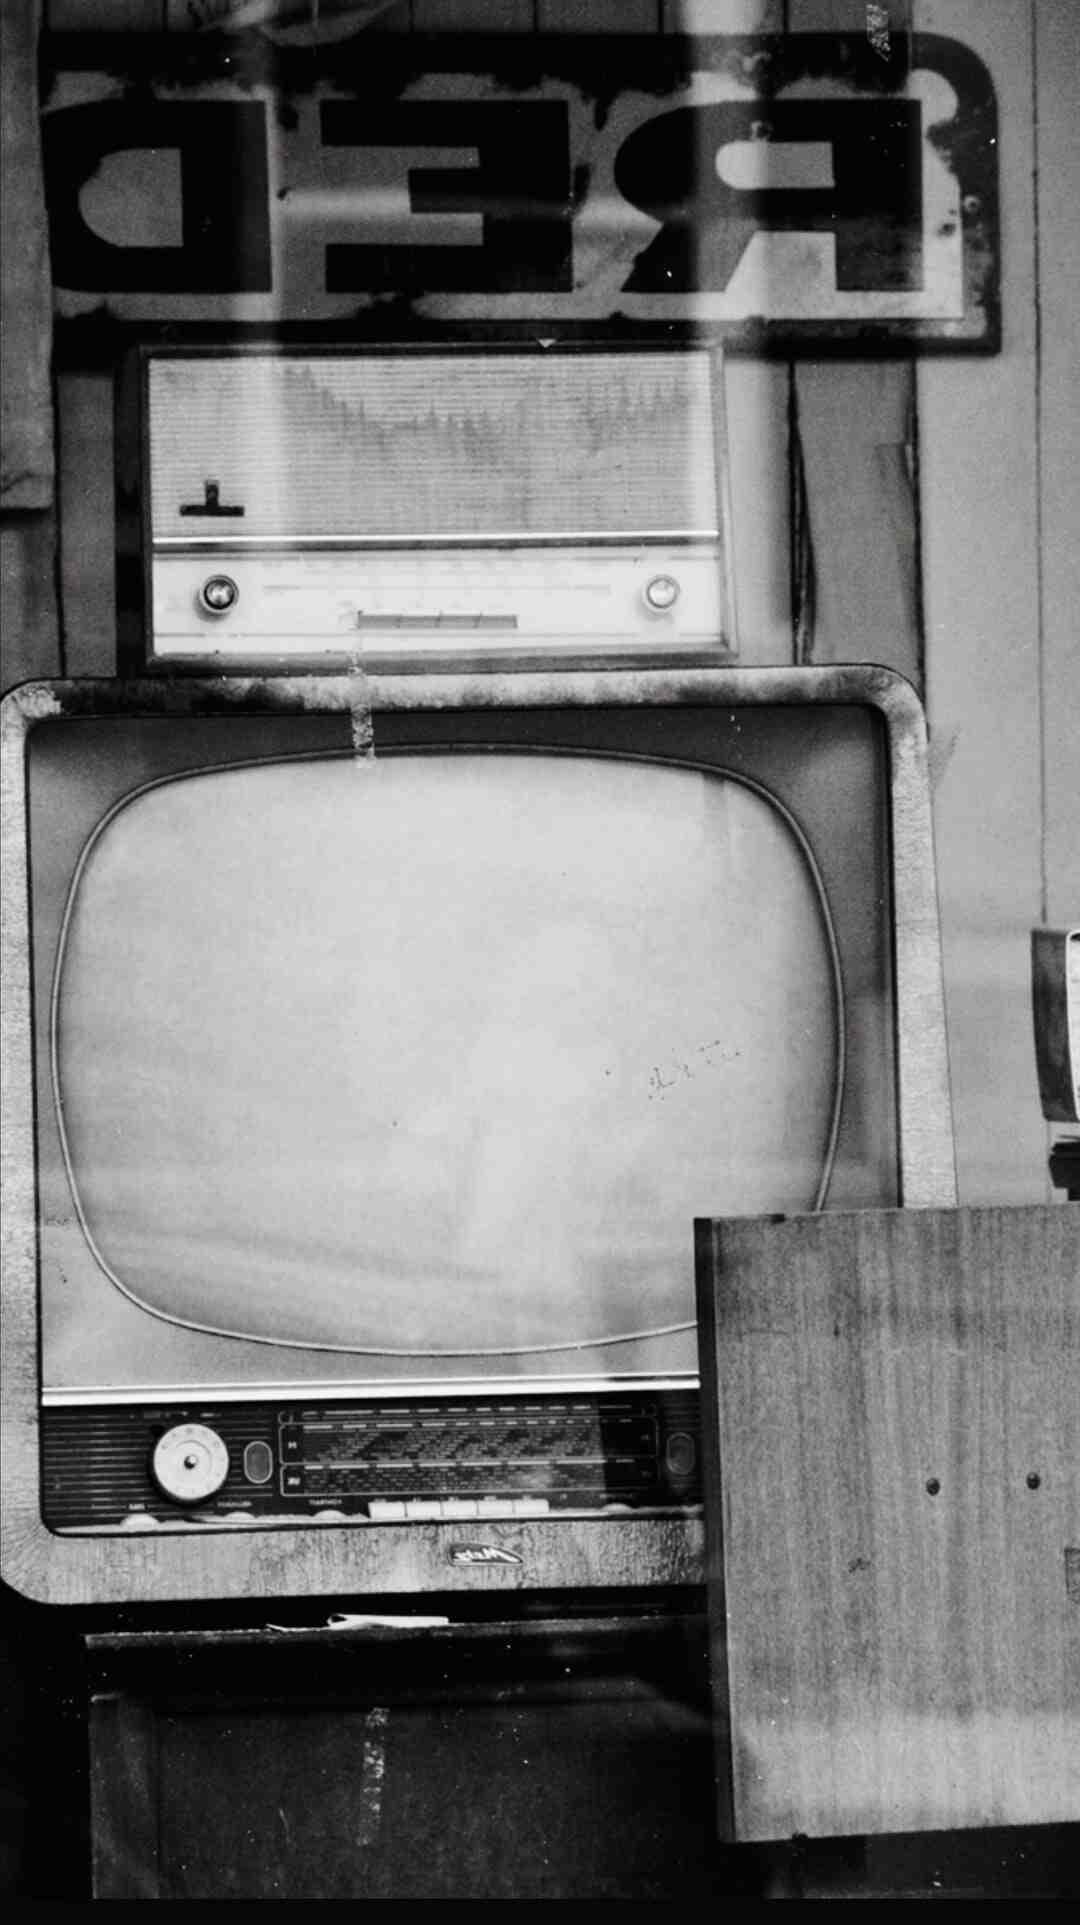 Quelle TV acheter en 2021 ?